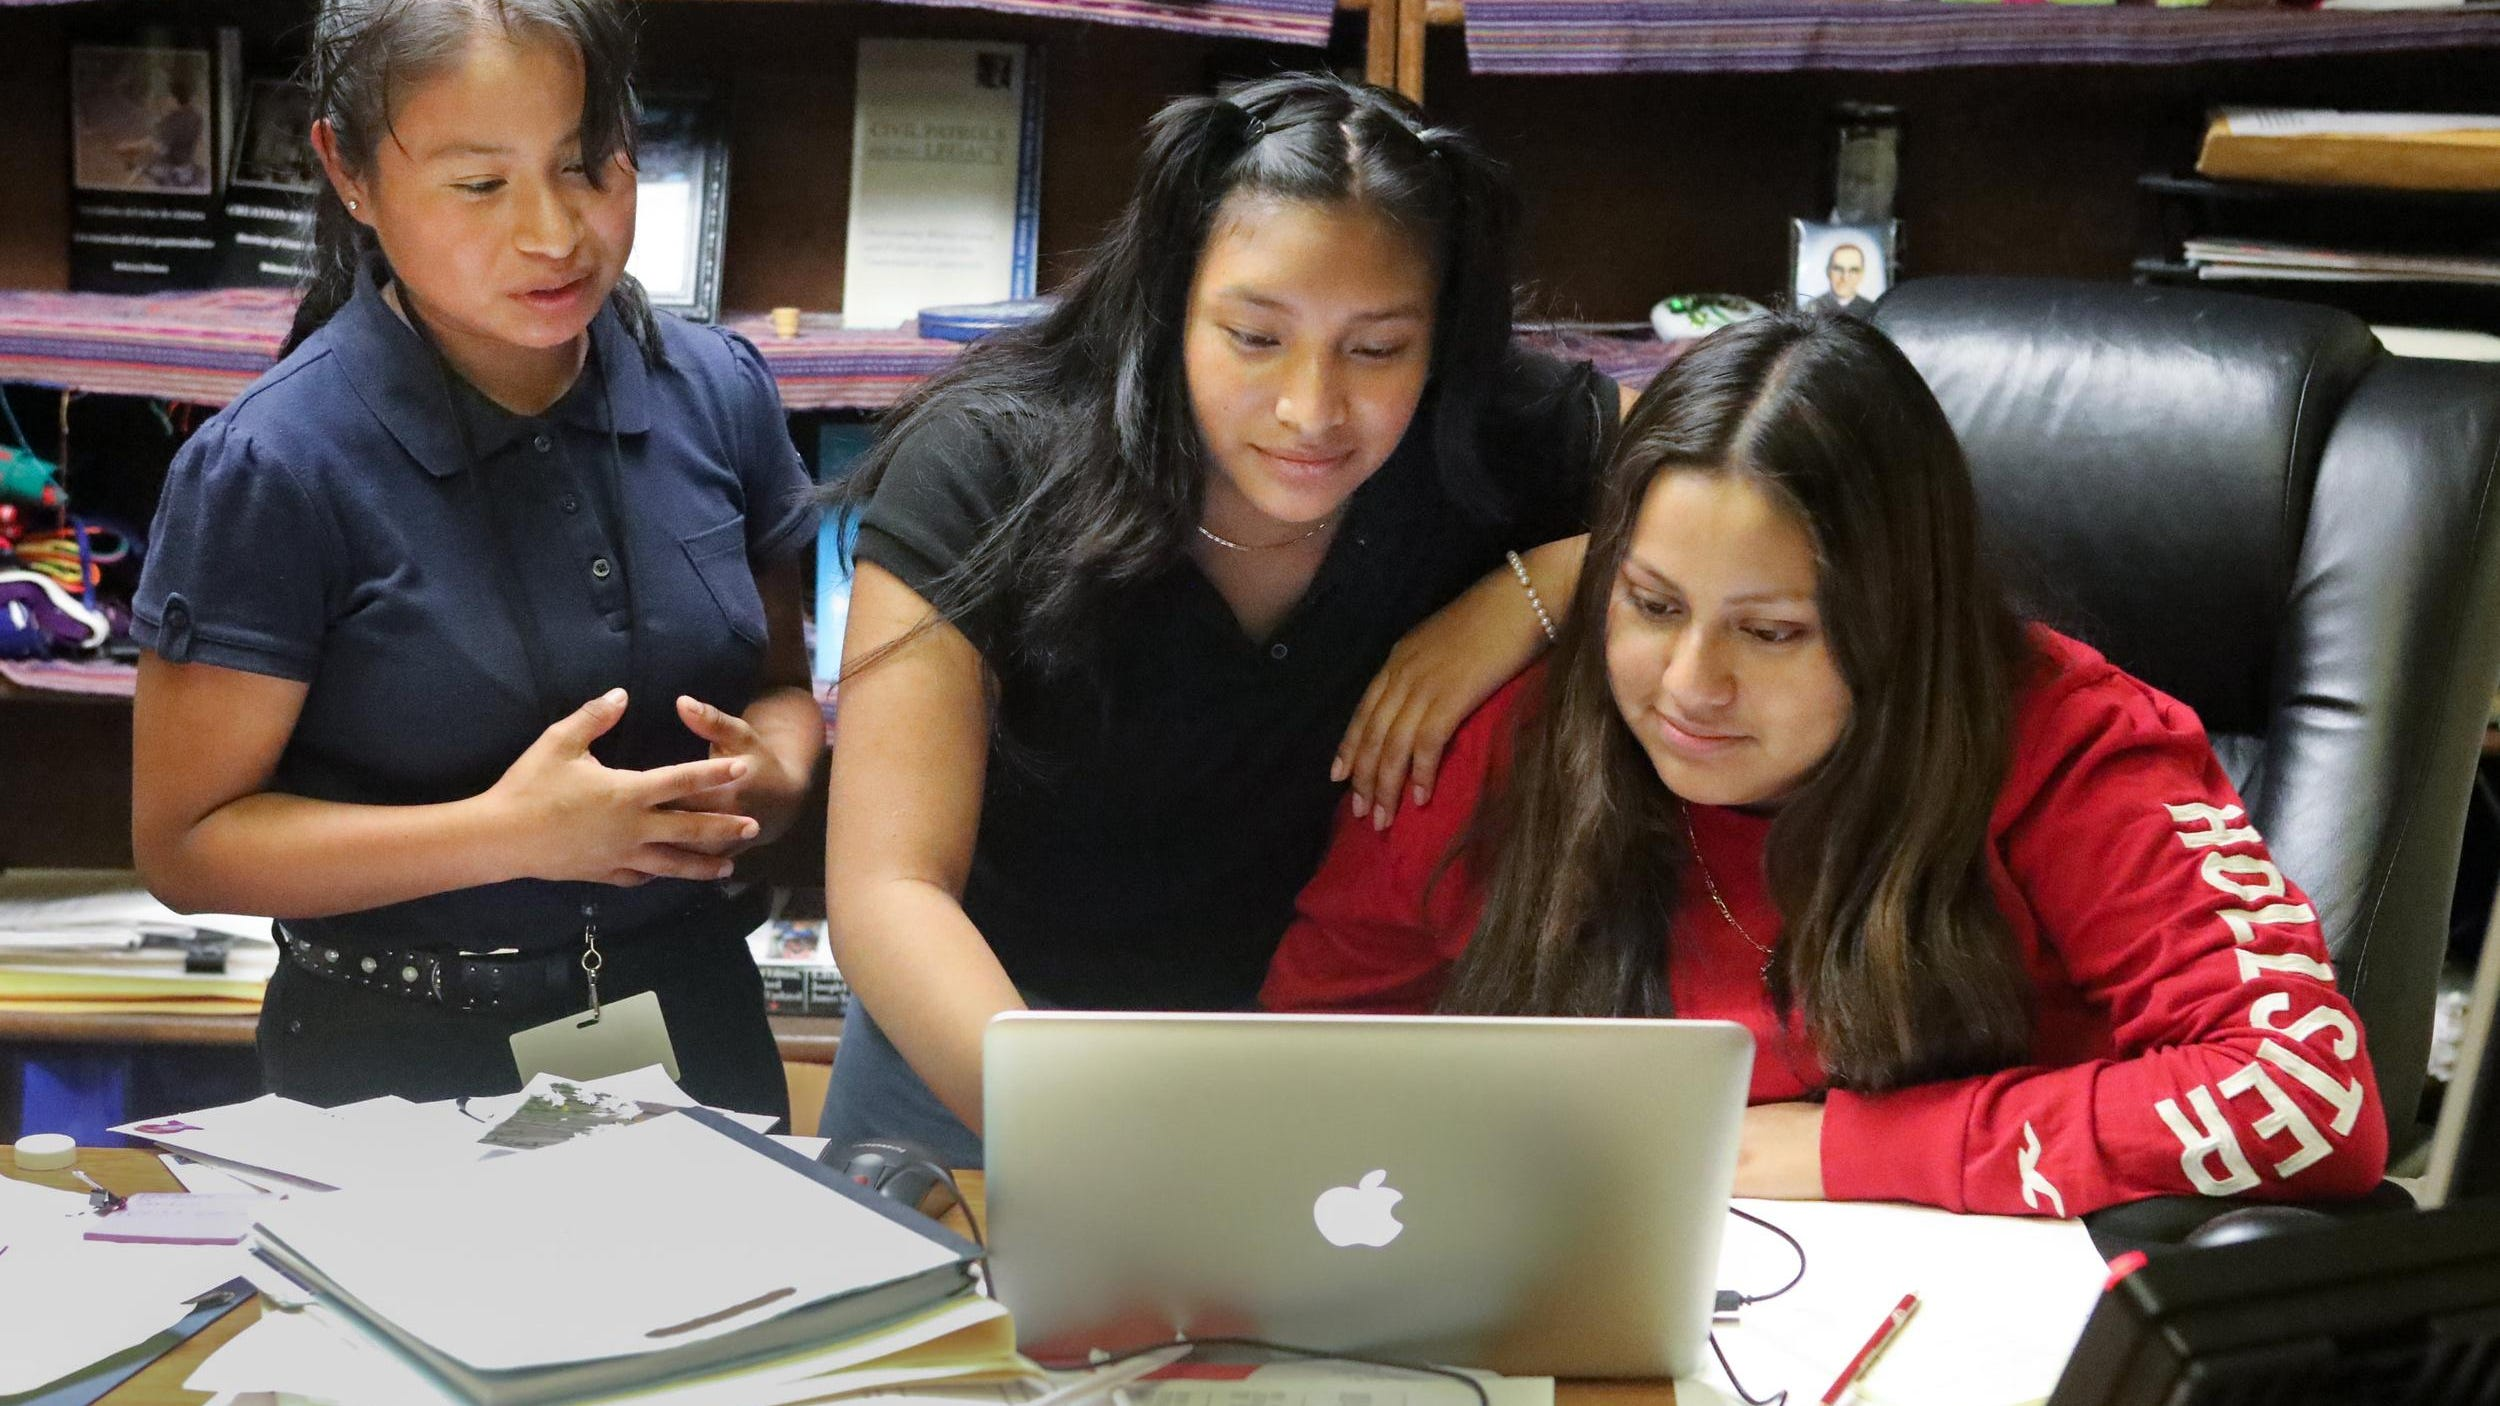 The Mayan Girls (from left) Yury Aracely Lopez Perez, 17, Madgalena Francisco, 16, and Lorena Felipe Sebastian, 17, translate a community center document into the indigenous language Akateco, Thursday, September 26, 2019.